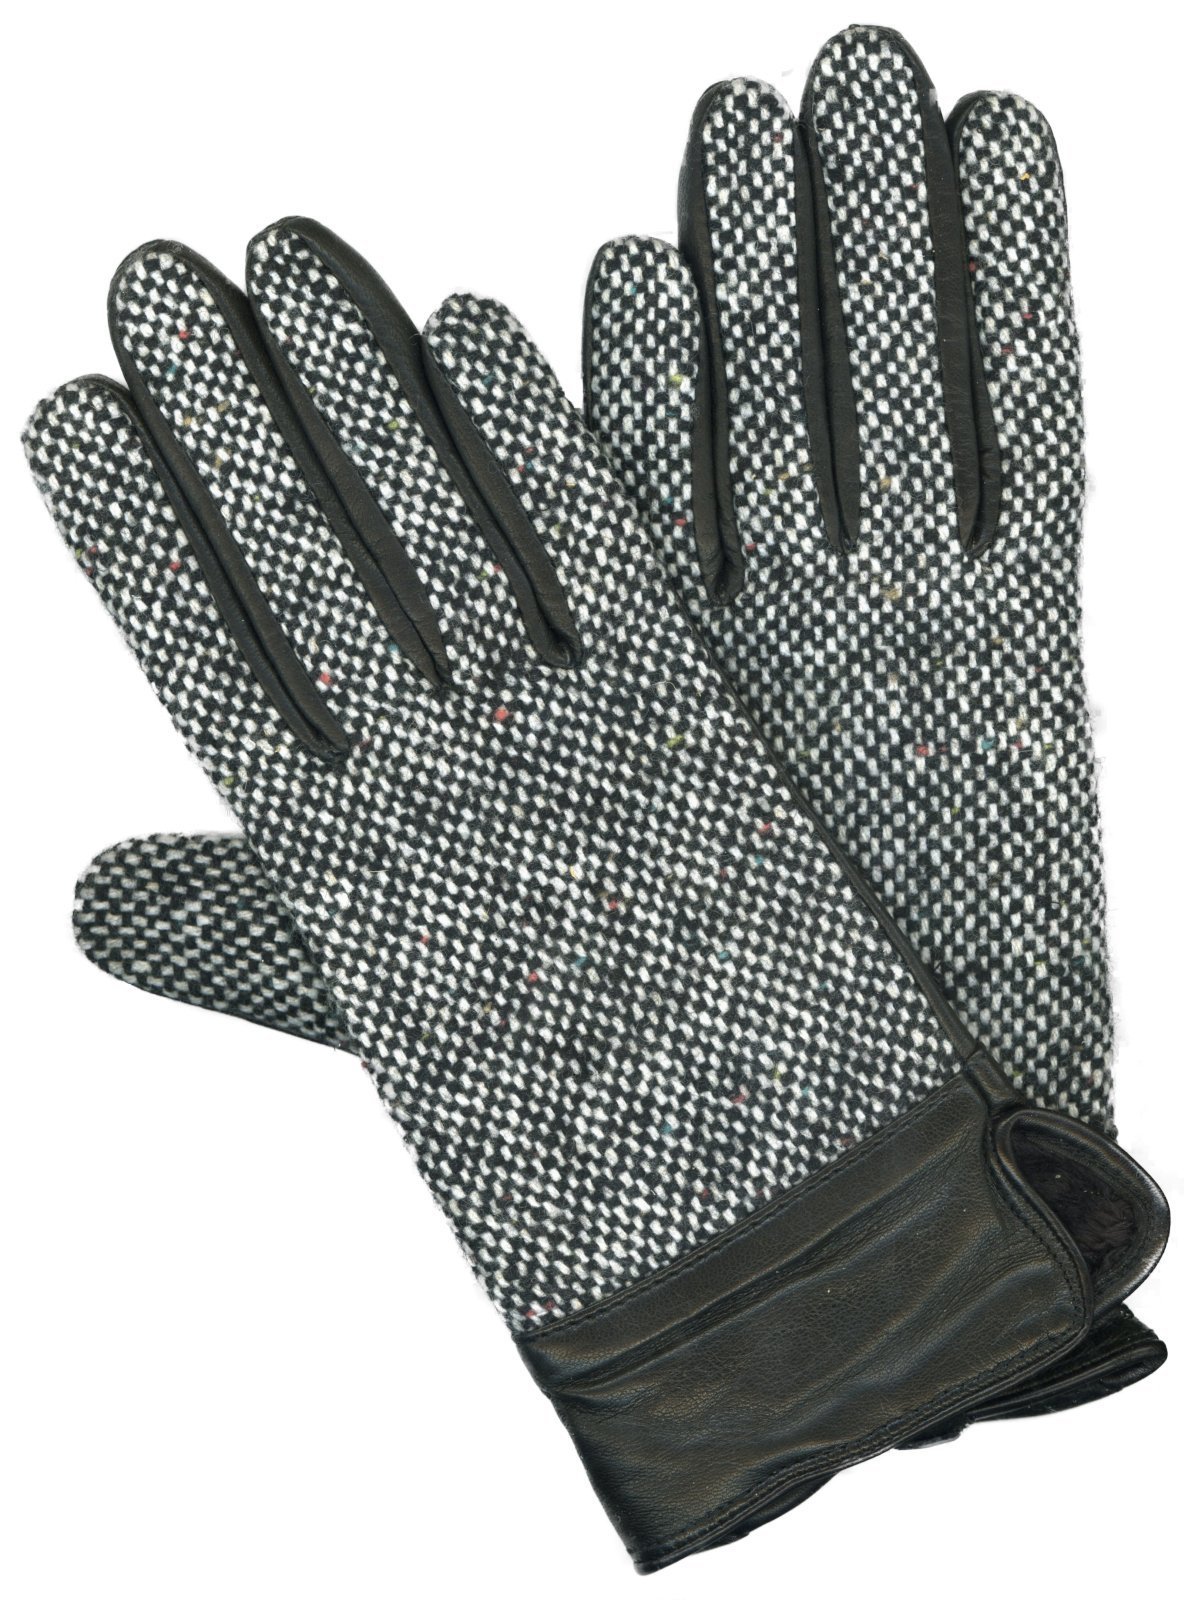 GRANDOE Women's BARLEY CORN TWEED Leather Palm Glove, Cashmere Blend Lined